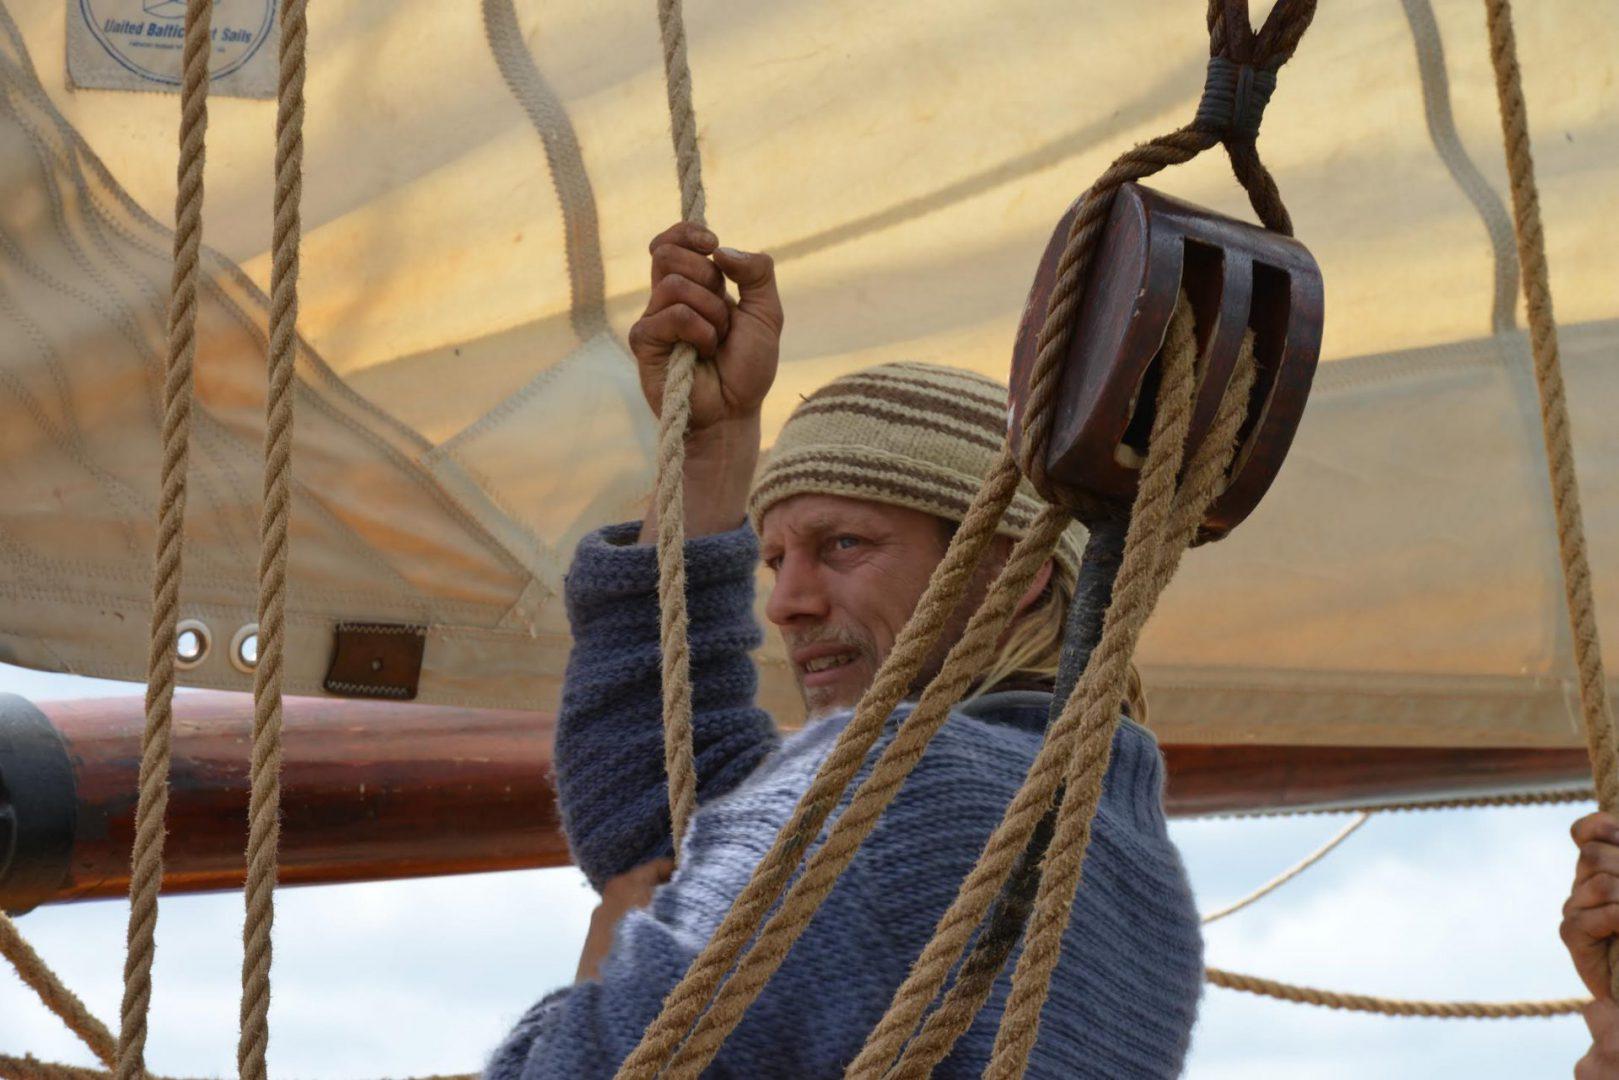 Skipper lammert